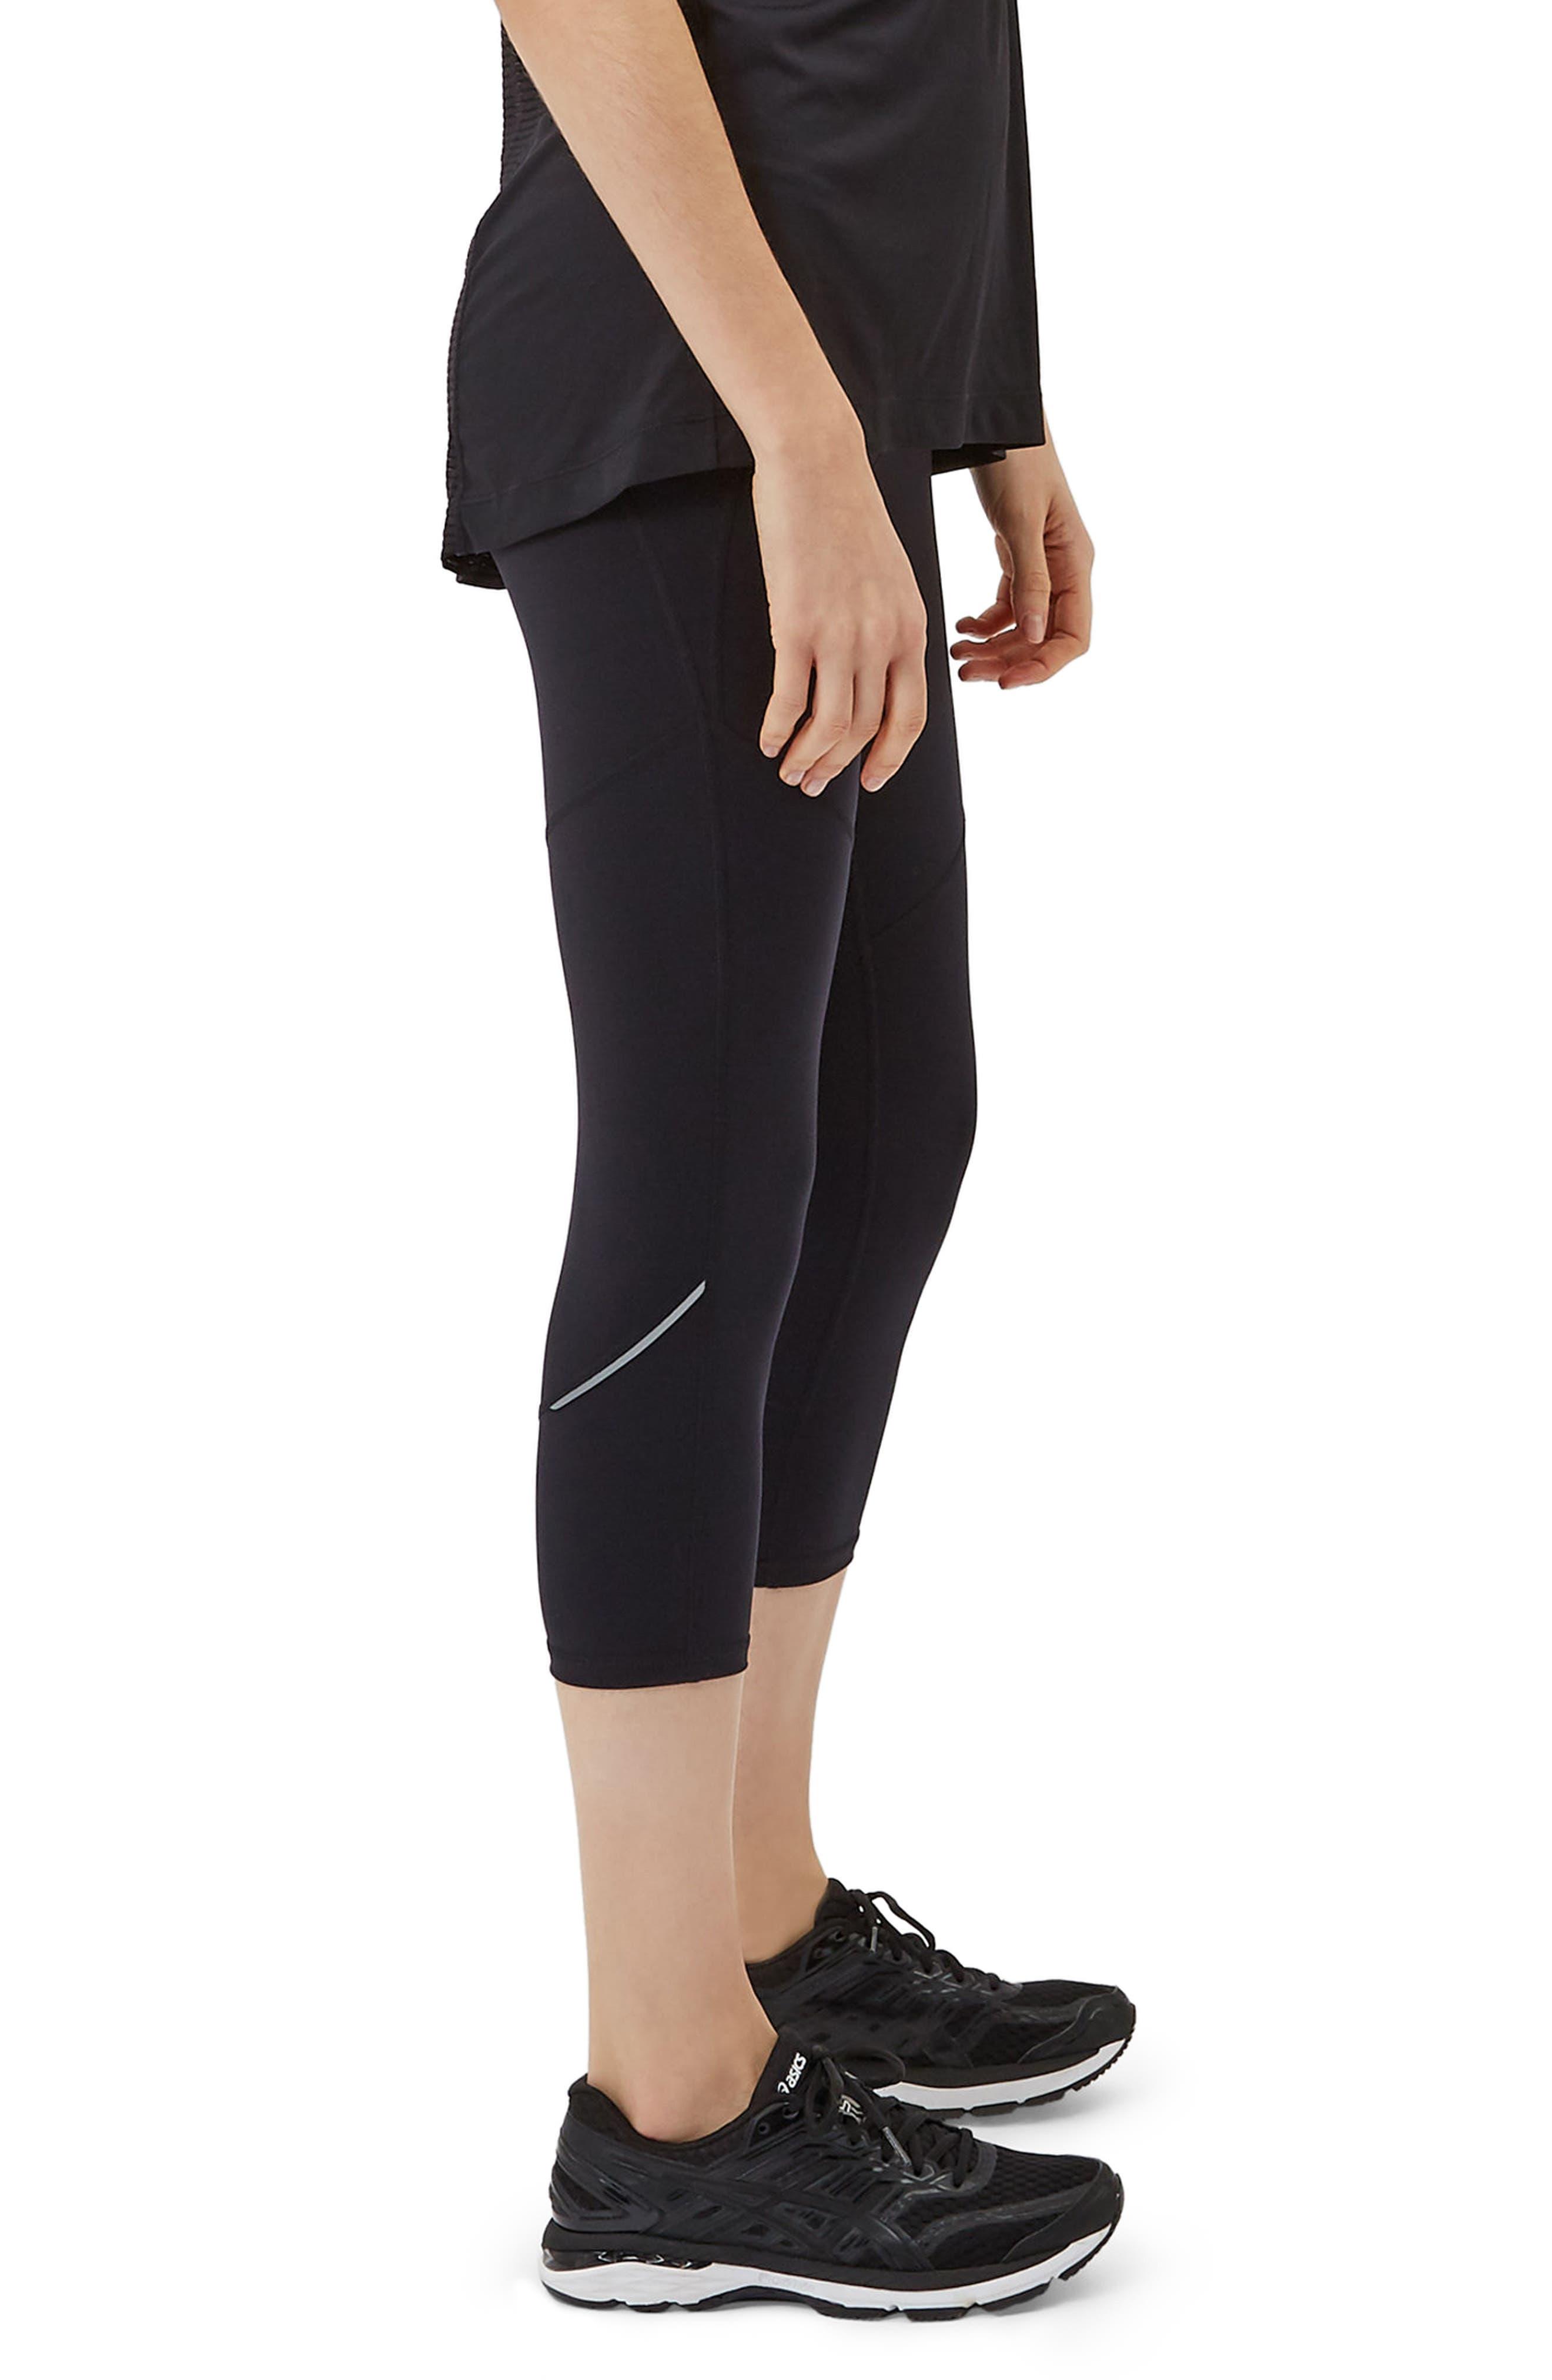 SWEATY BETTY, Power Workout Crop Leggings, Alternate thumbnail 5, color, BLACK